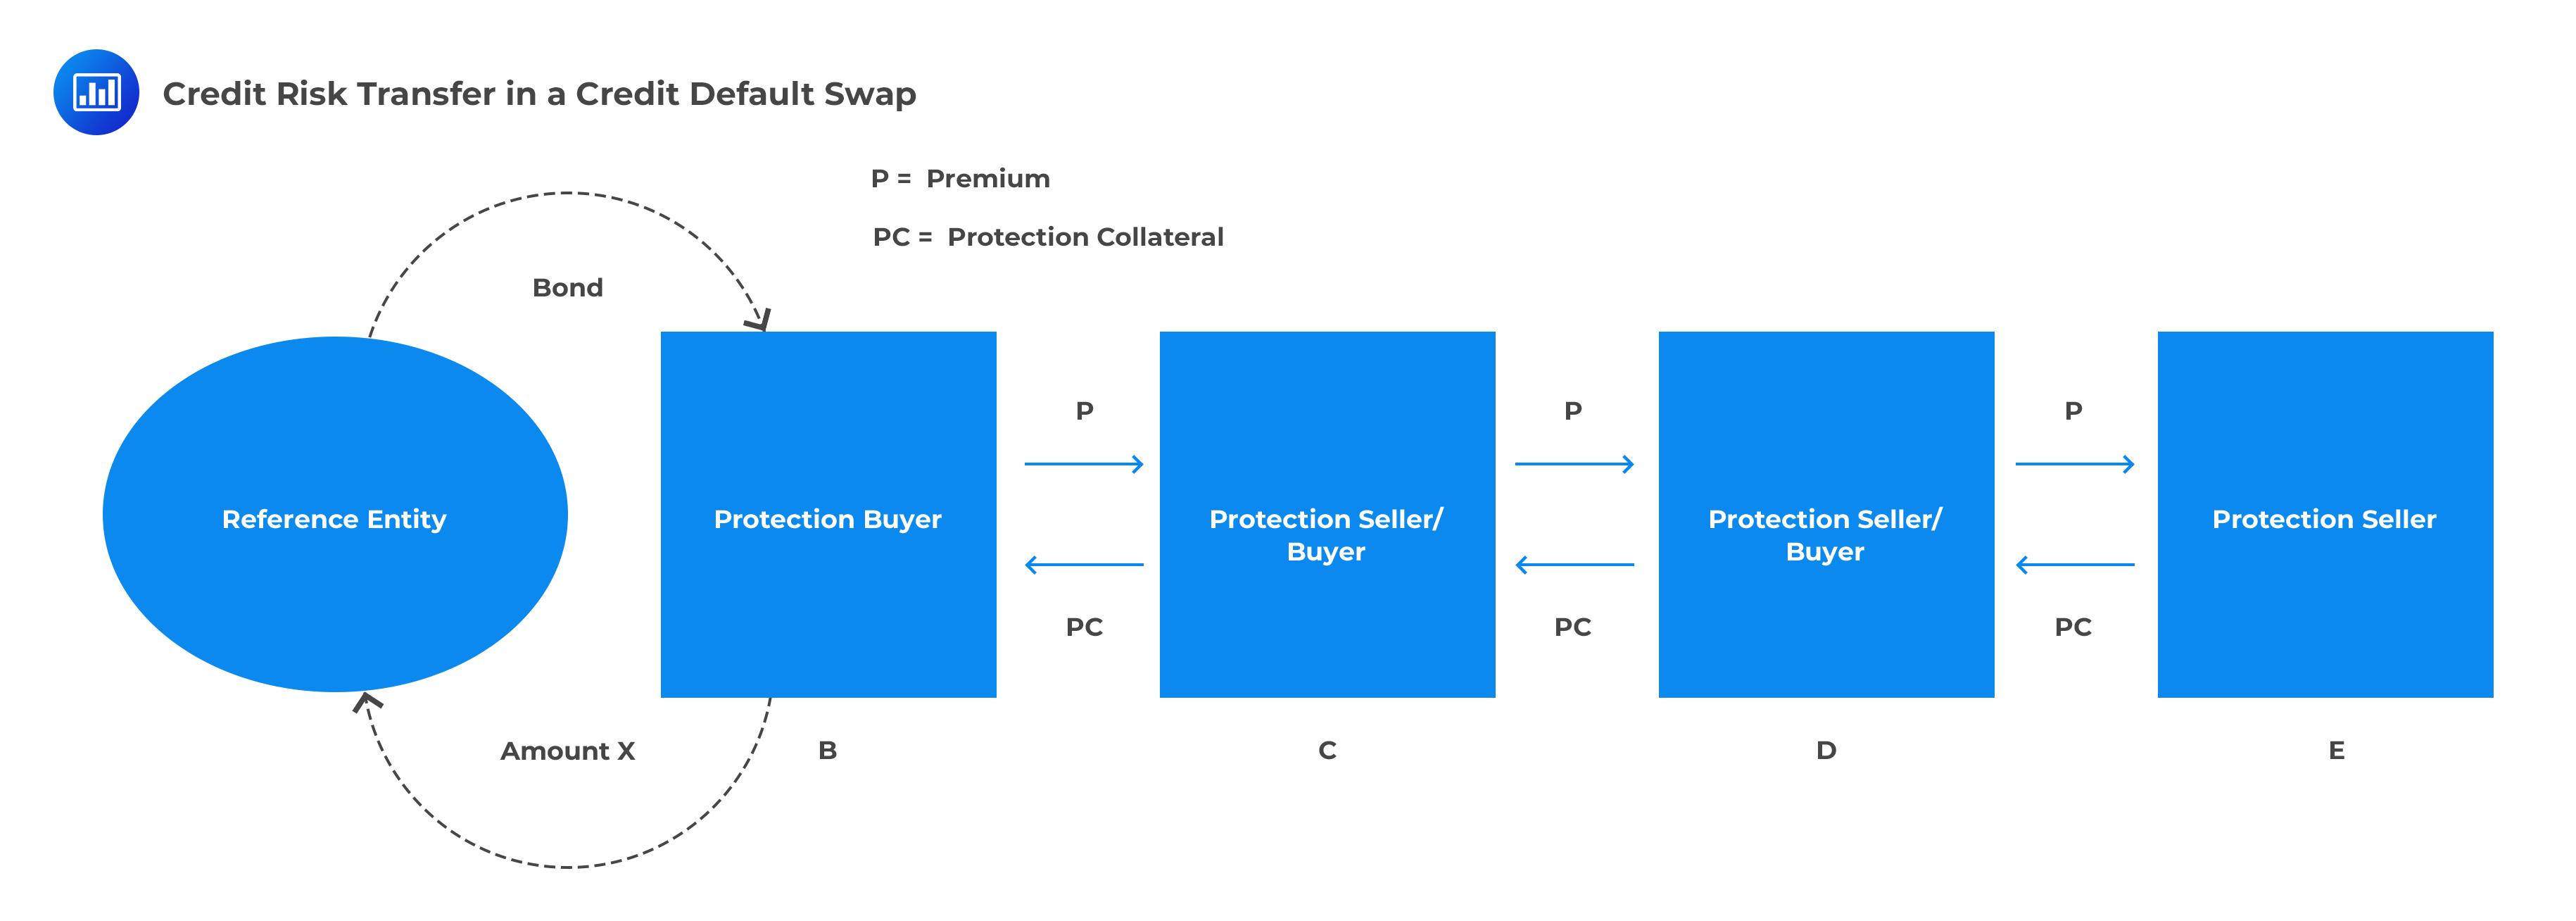 Credit Risk Transfer in a Credit Default Swap